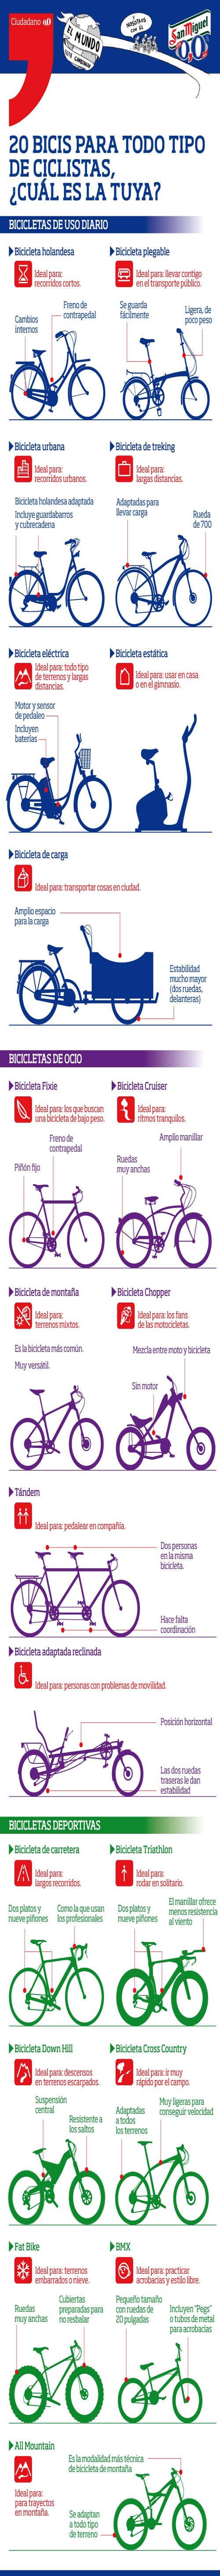 tipos-bicicletas-infografia